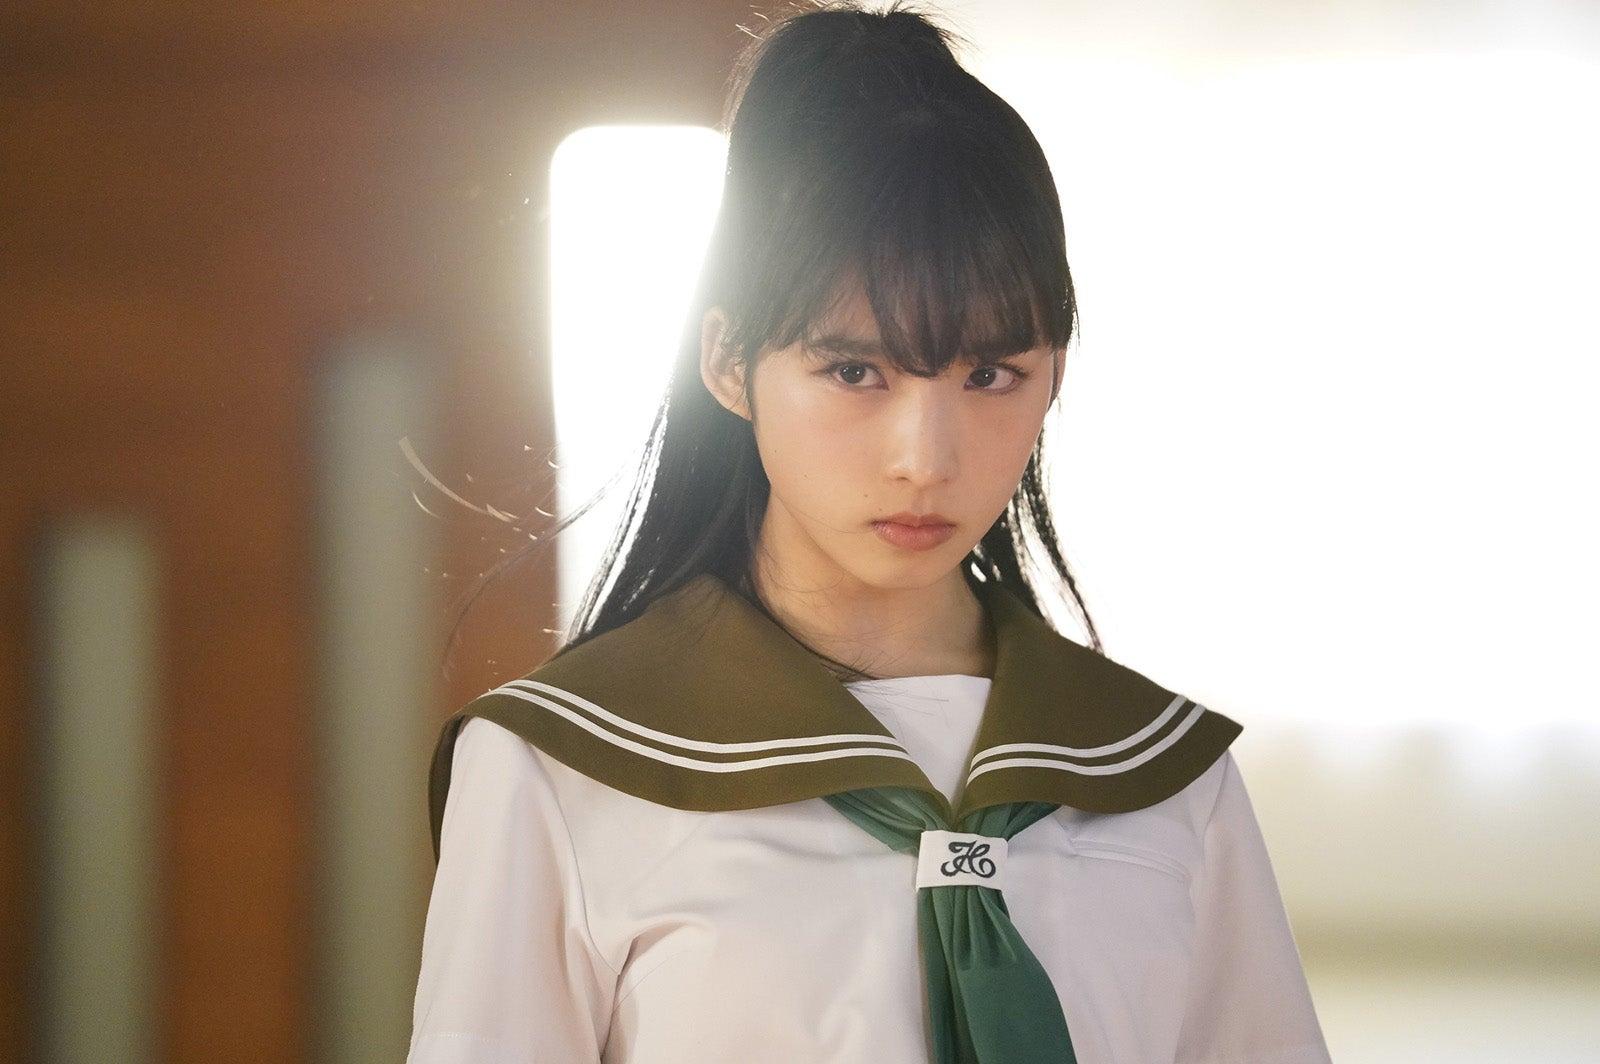 "8Fj31uQT04 uKtlXkvorjvhBuIyKsFzaEki6CRwL0 0 - 【AKB48】「2万年に1人の美少女」小栗有以、強い眼差しにノックアウト ""平成のジャンヌダルク""に"